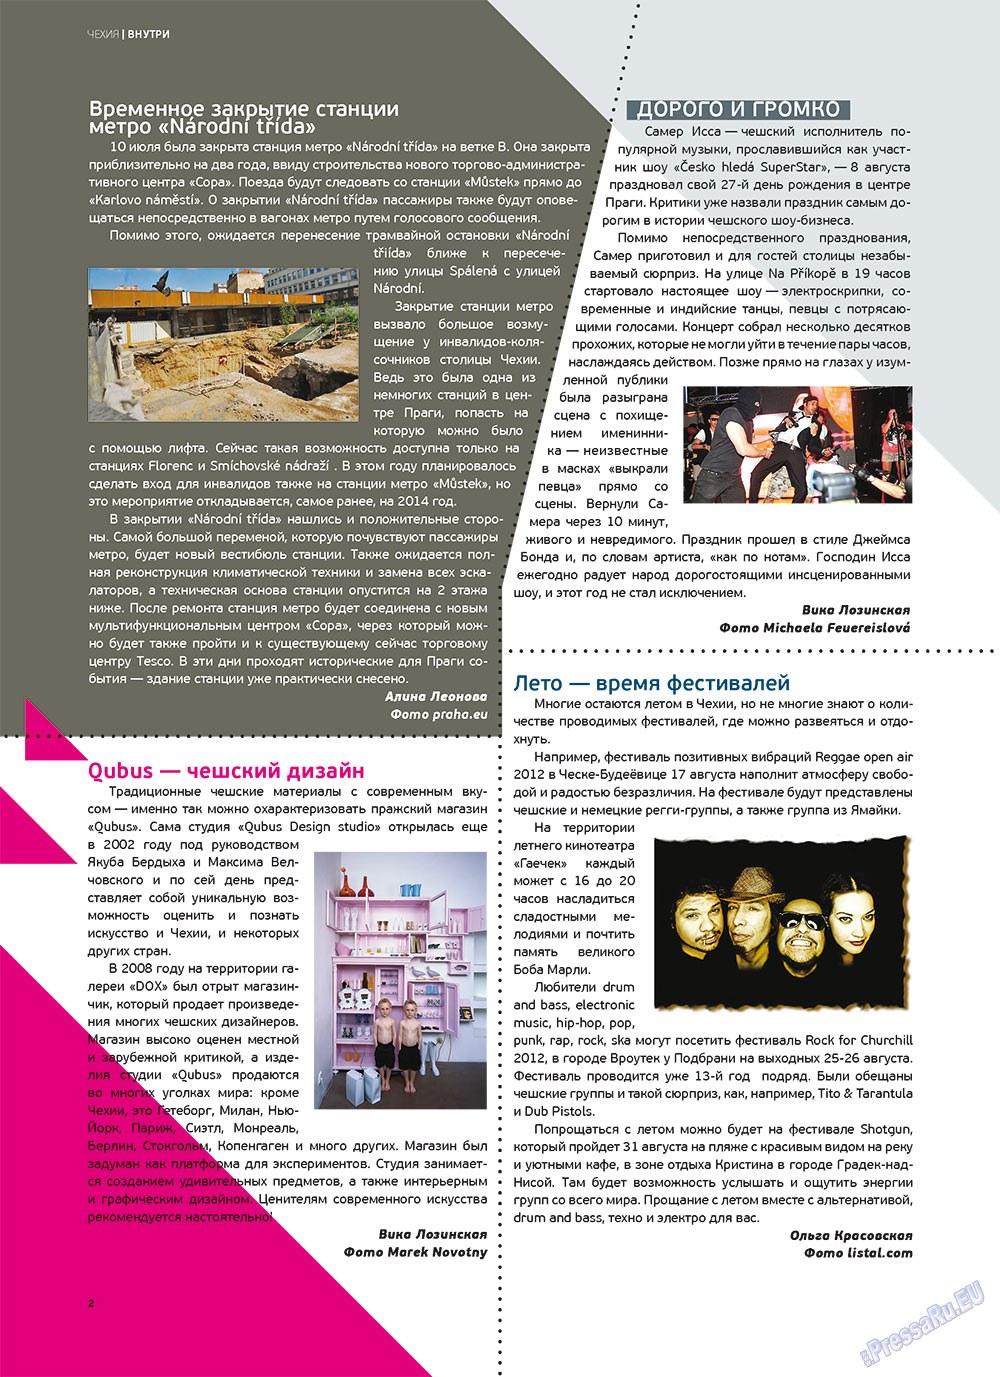 Артек (журнал). 2012 год, номер 3, стр. 4